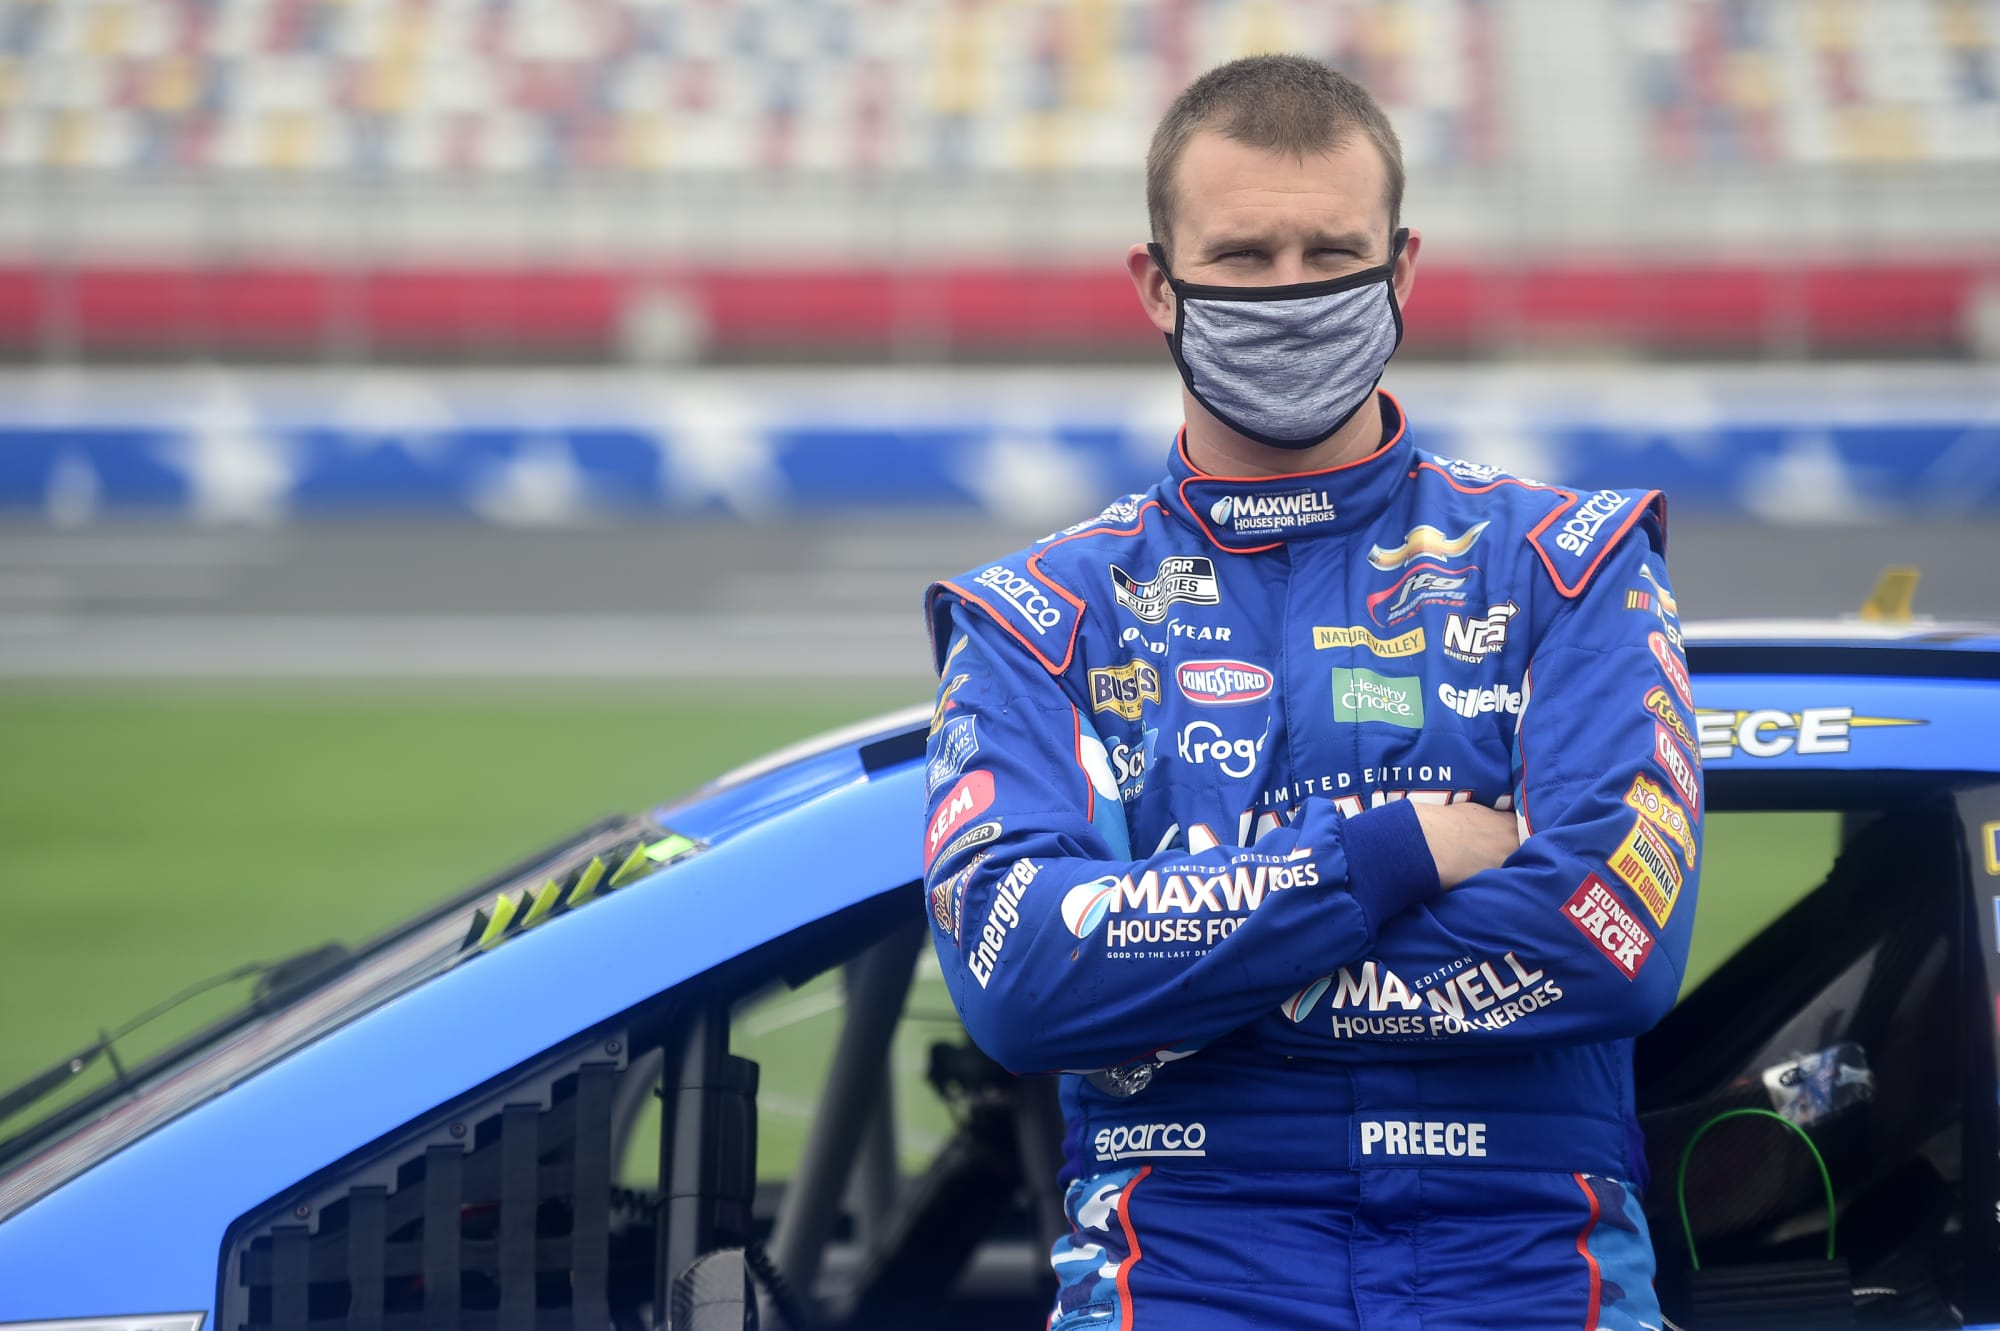 NASCAR: Ryan Preece to return to JTG Daugherty Racing in 2021